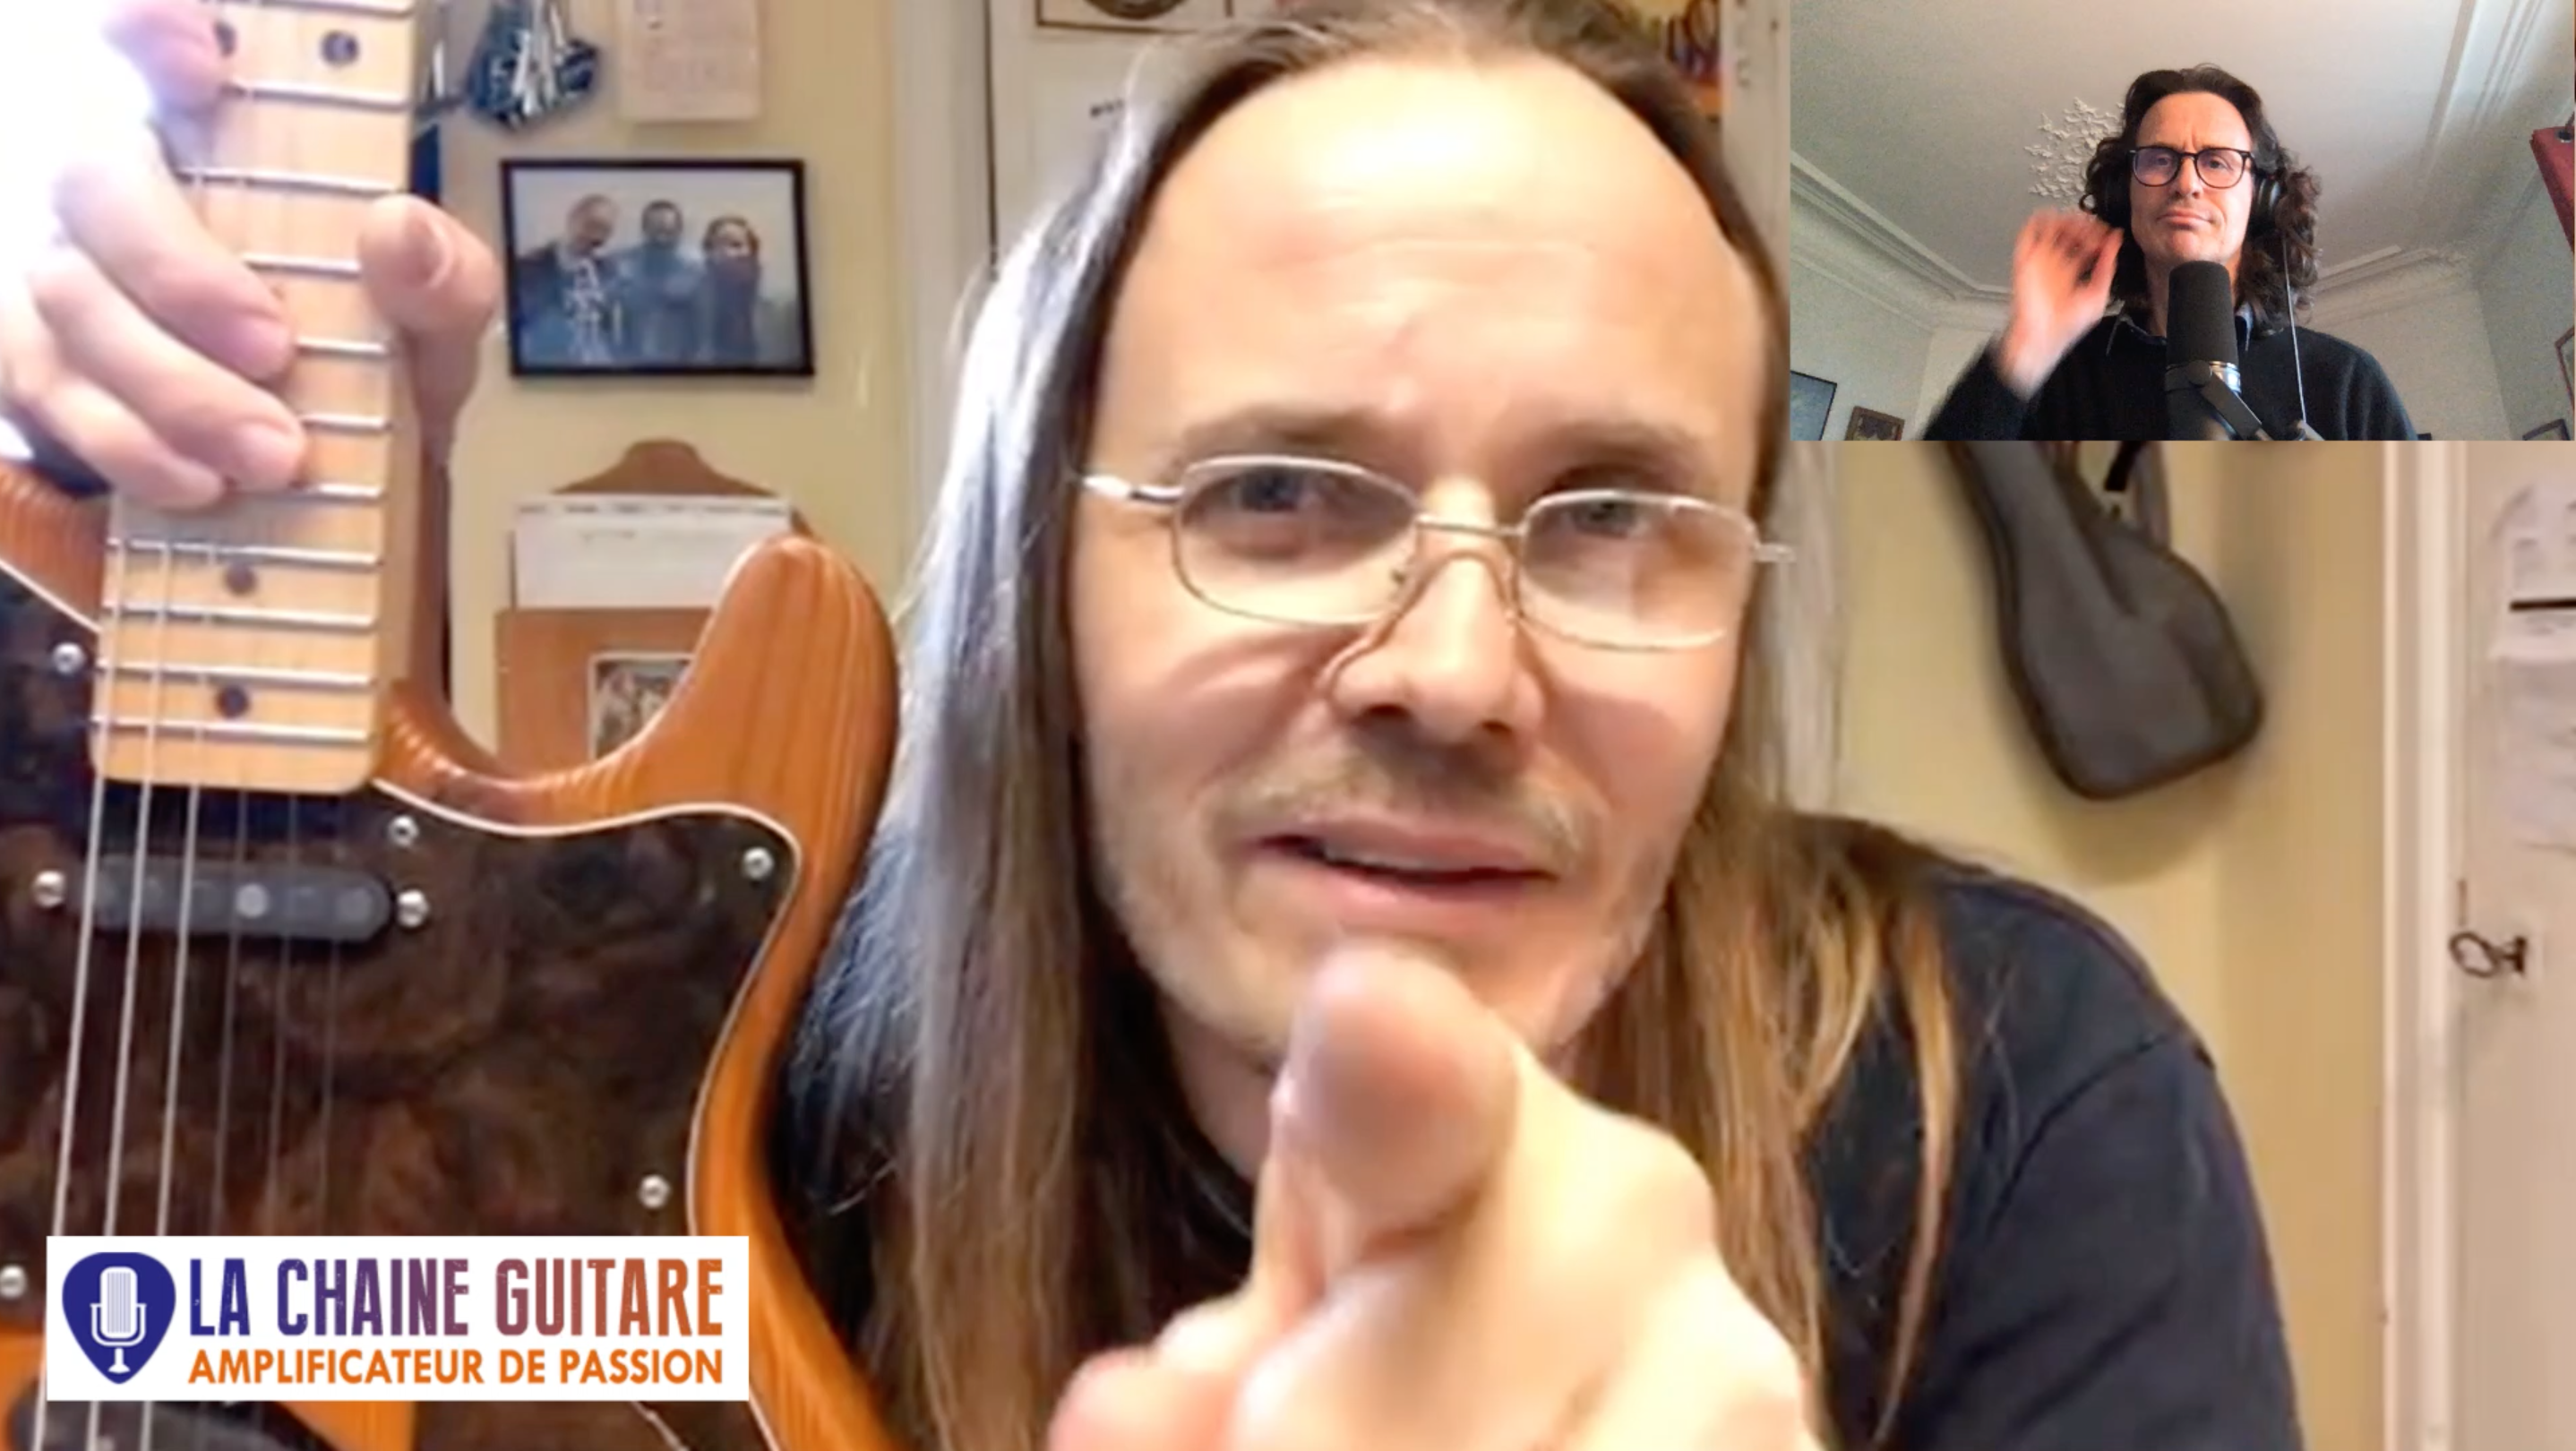 Juha Ruokangas master builder finlandais en interview confinement